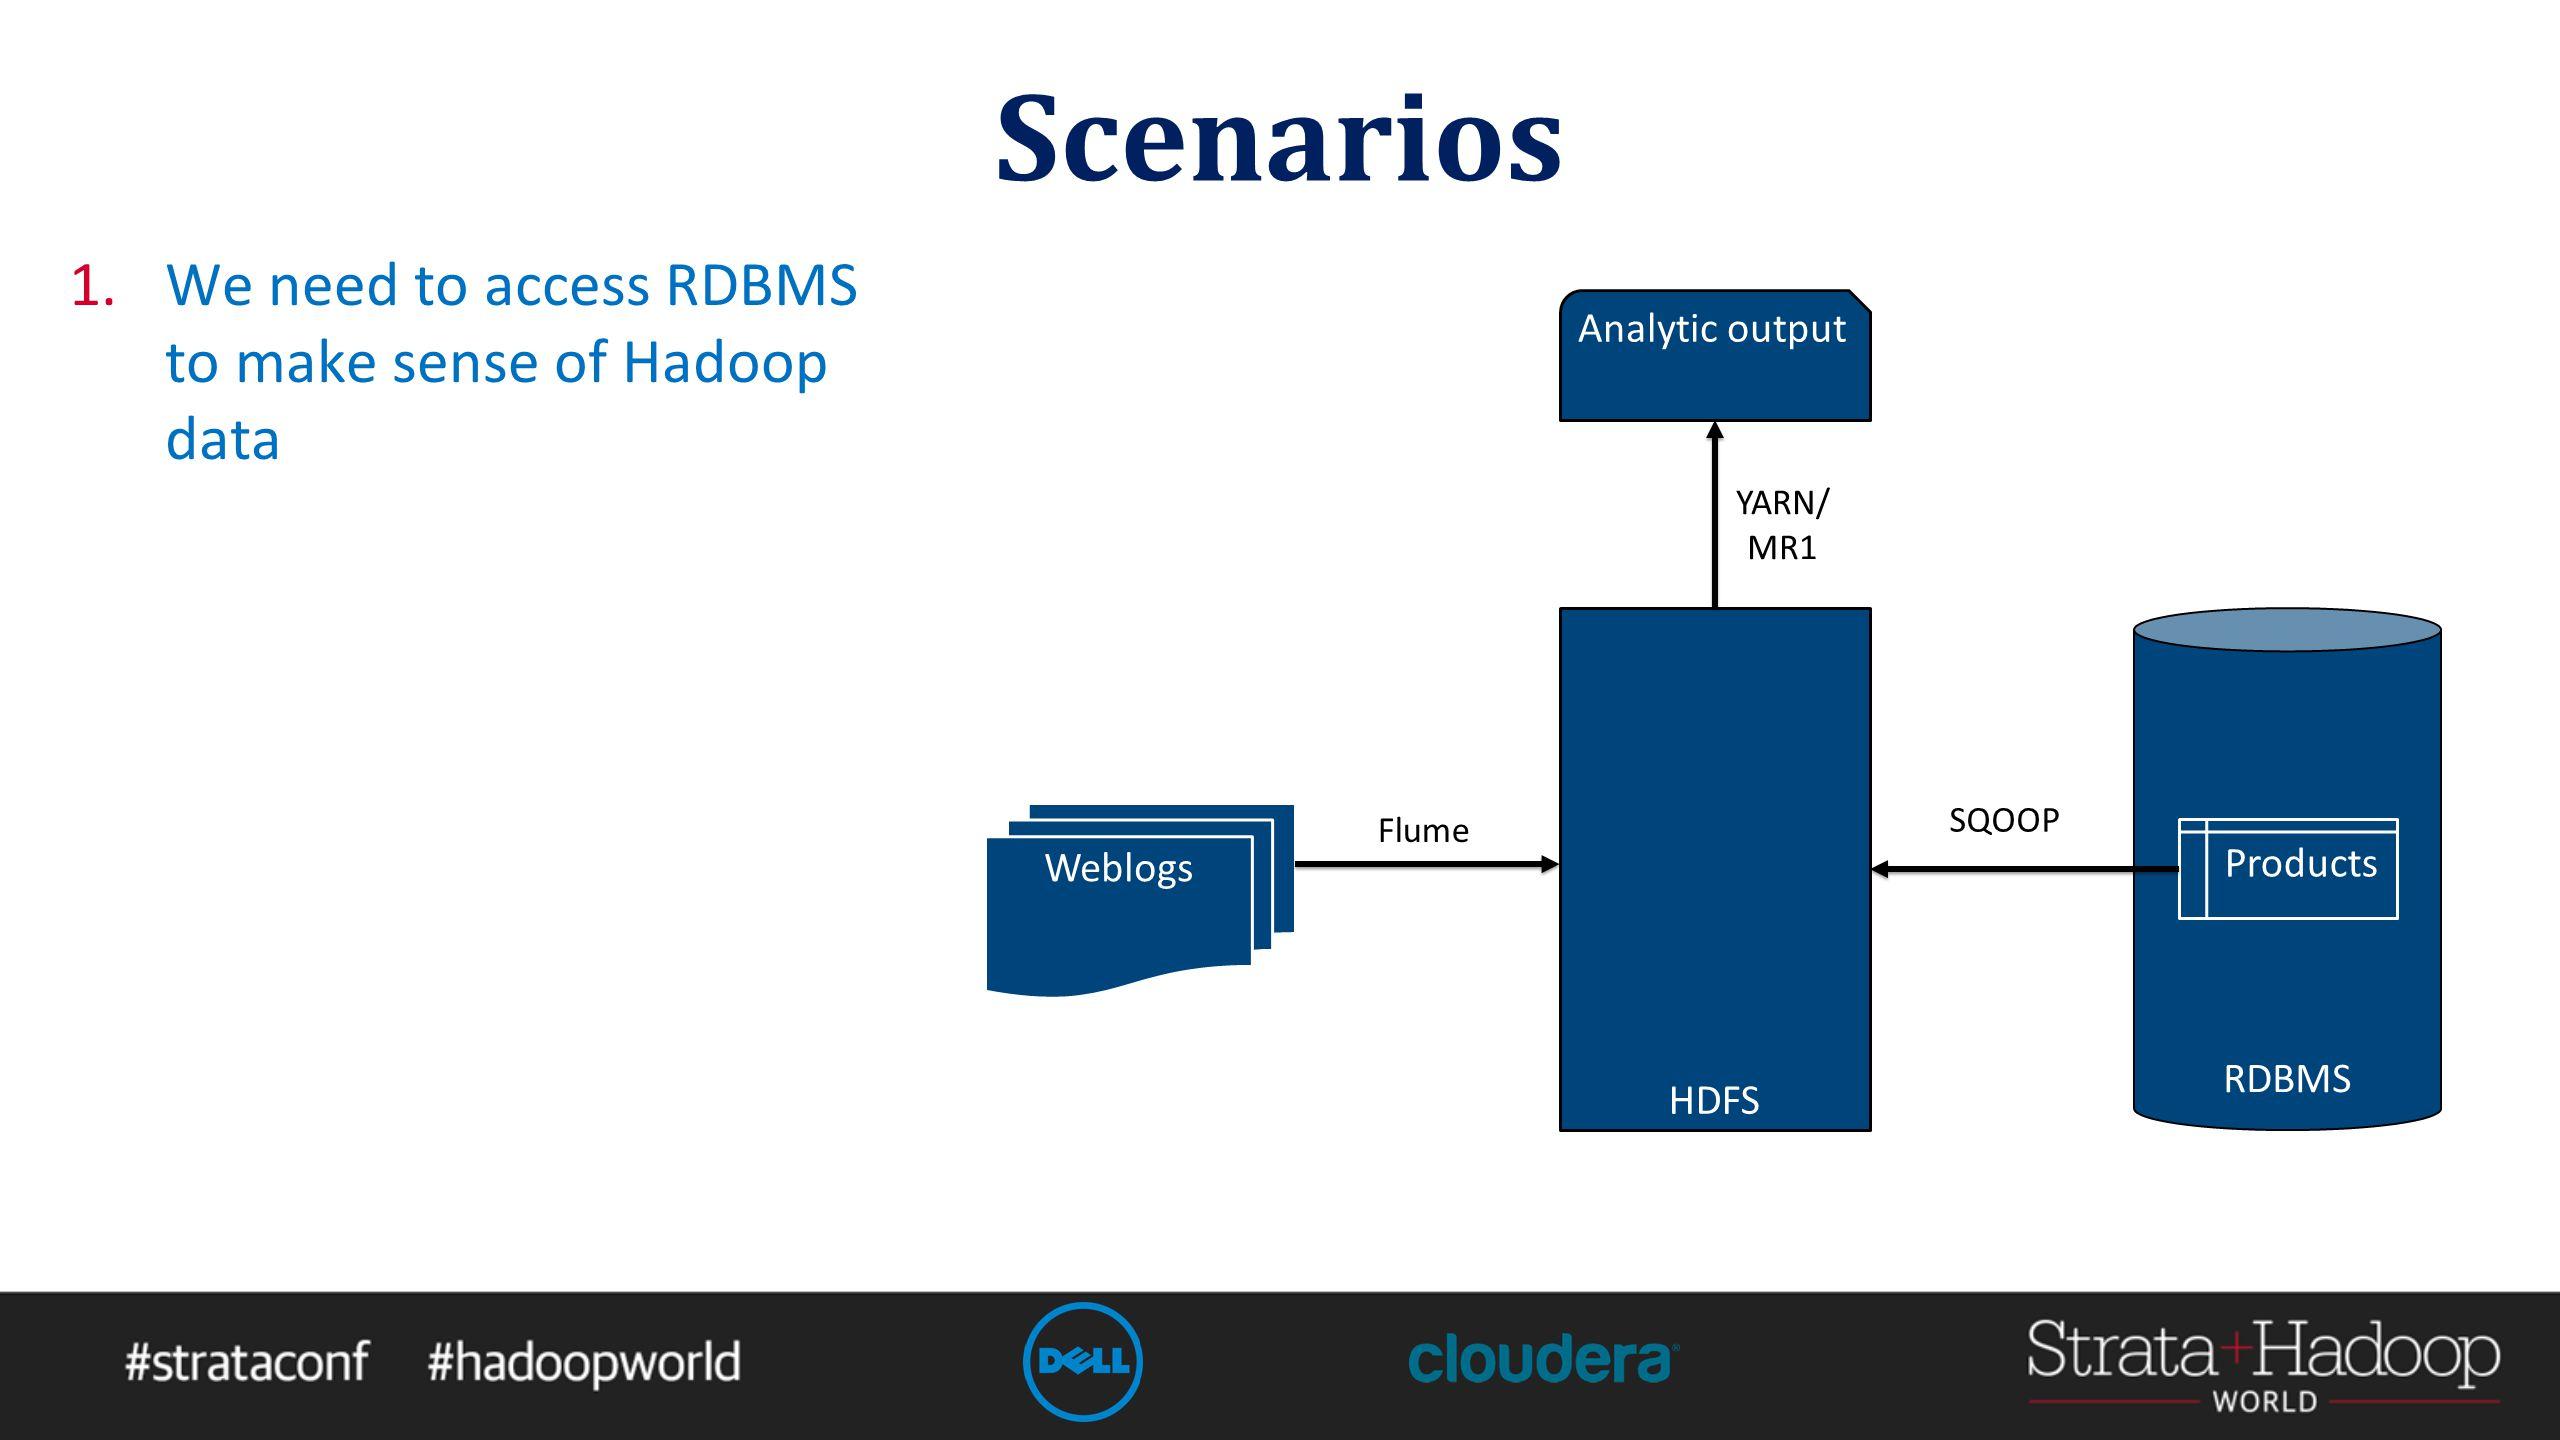 Scenarios 1.We need to access RDBMS to make sense of Hadoop data HDFS Analytic output Weblogs RDBMS Products Flume SQOOP YARN/ MR1